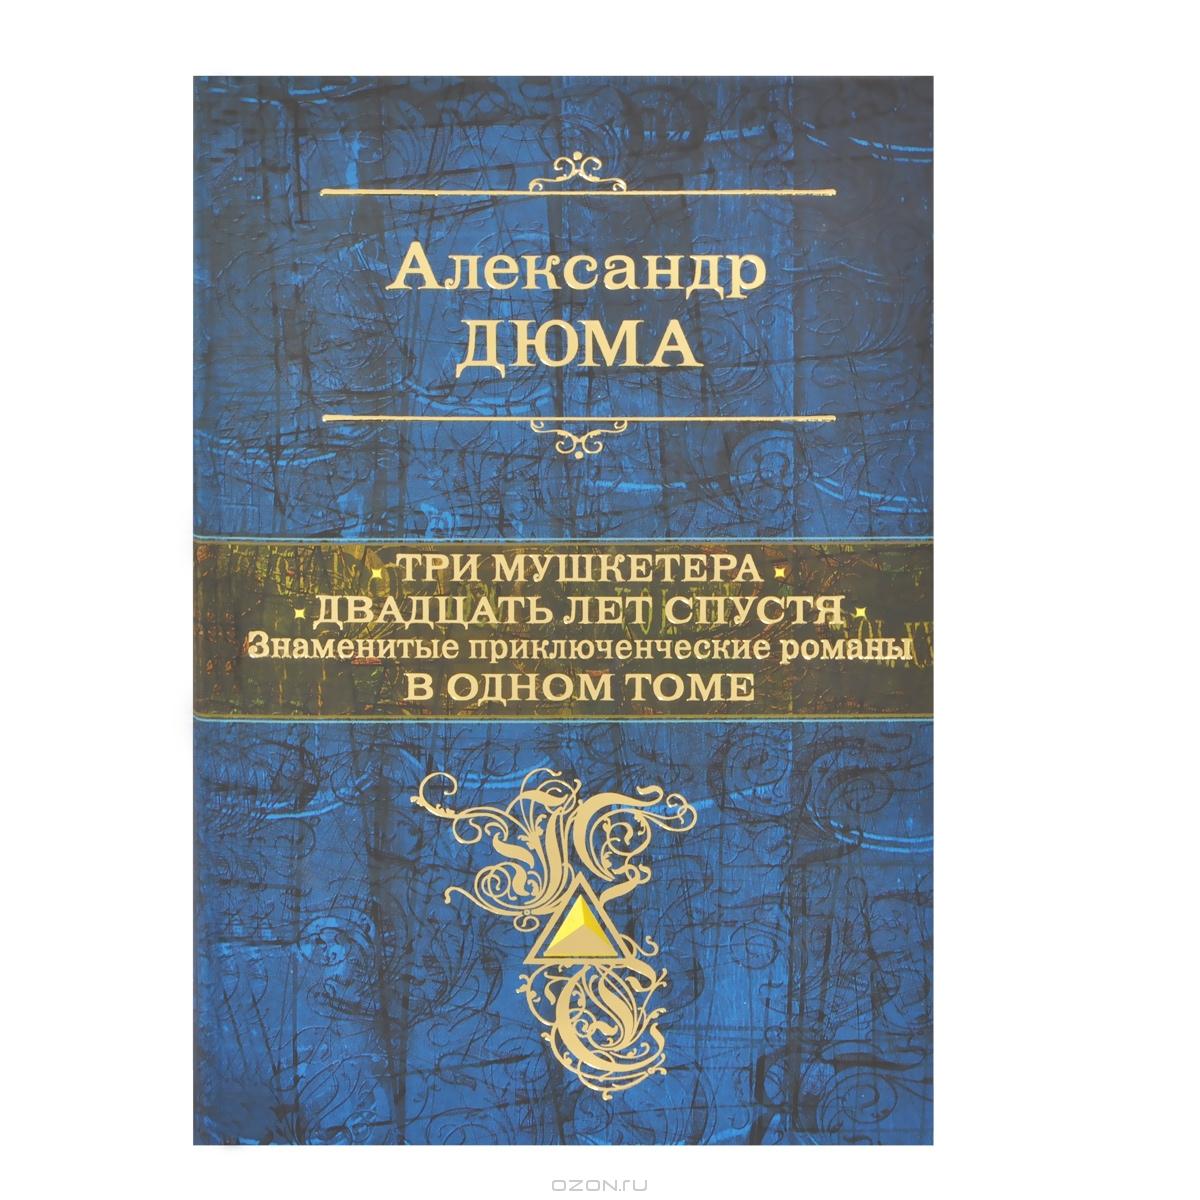 Сколько страниц в романе дюма три мушкетера 19 фотография